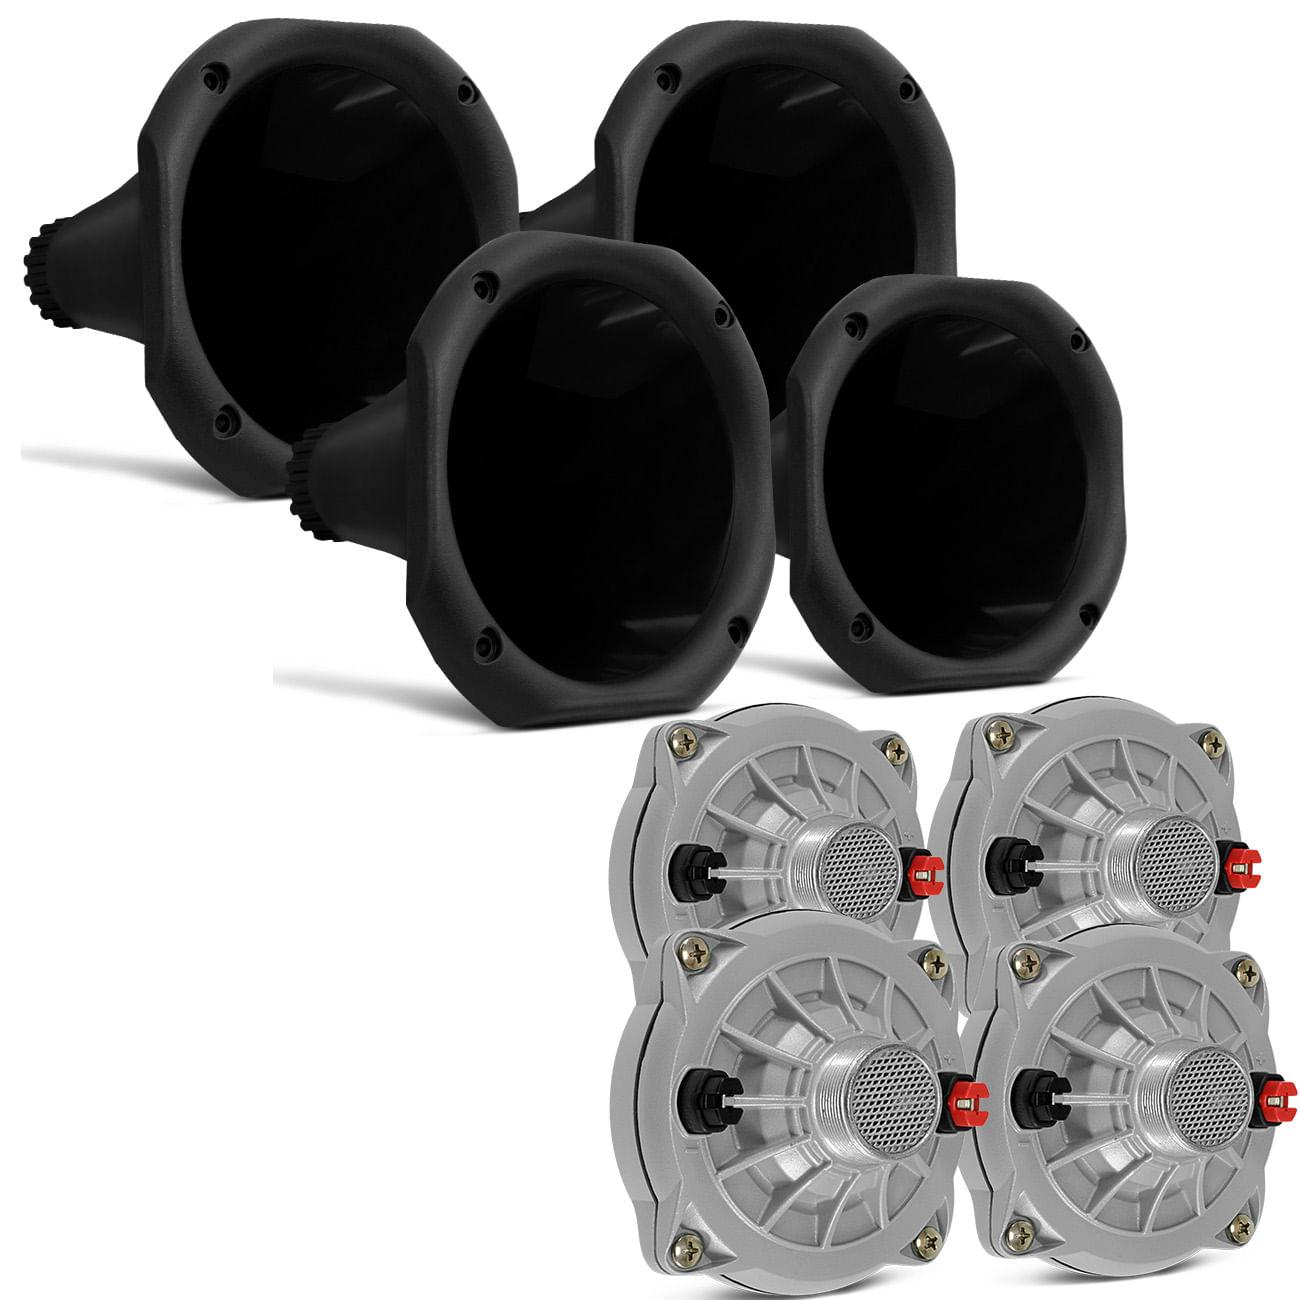 Kit 4 Drivers Selenium JBL D250X 100W 8 Ohms Fenólico Trio Elétrico + 4 Cornetas Curta